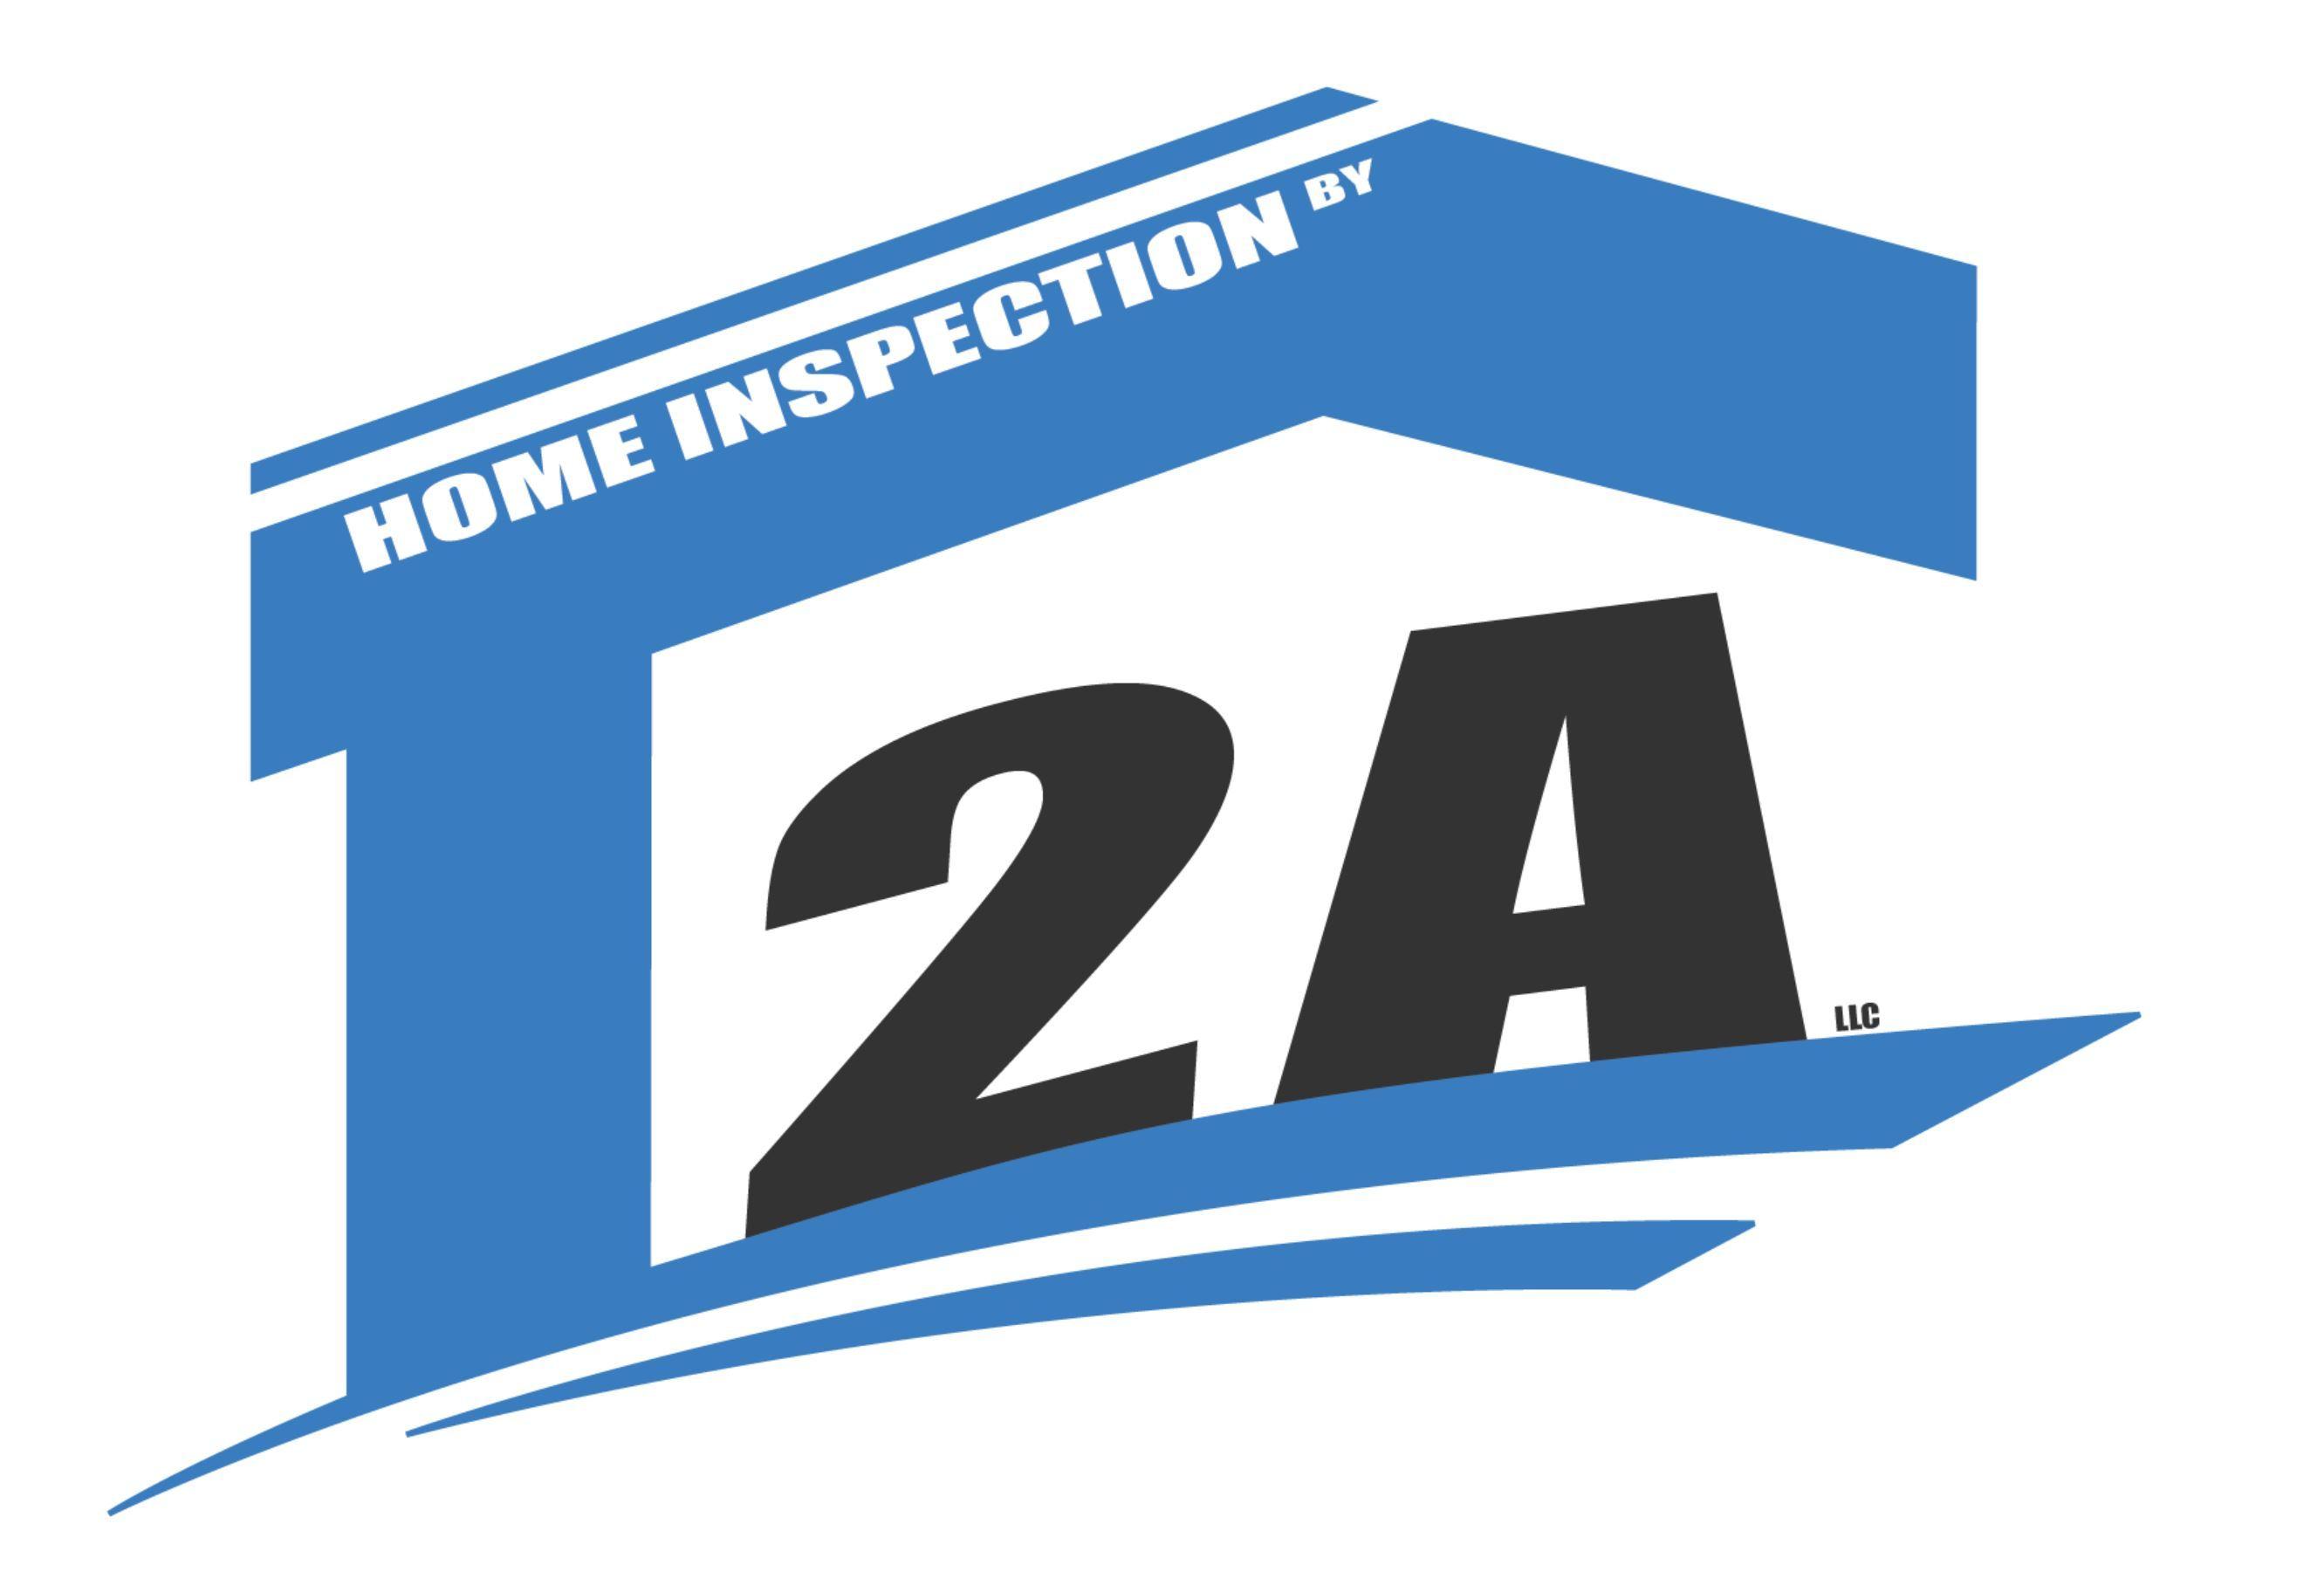 2a logo